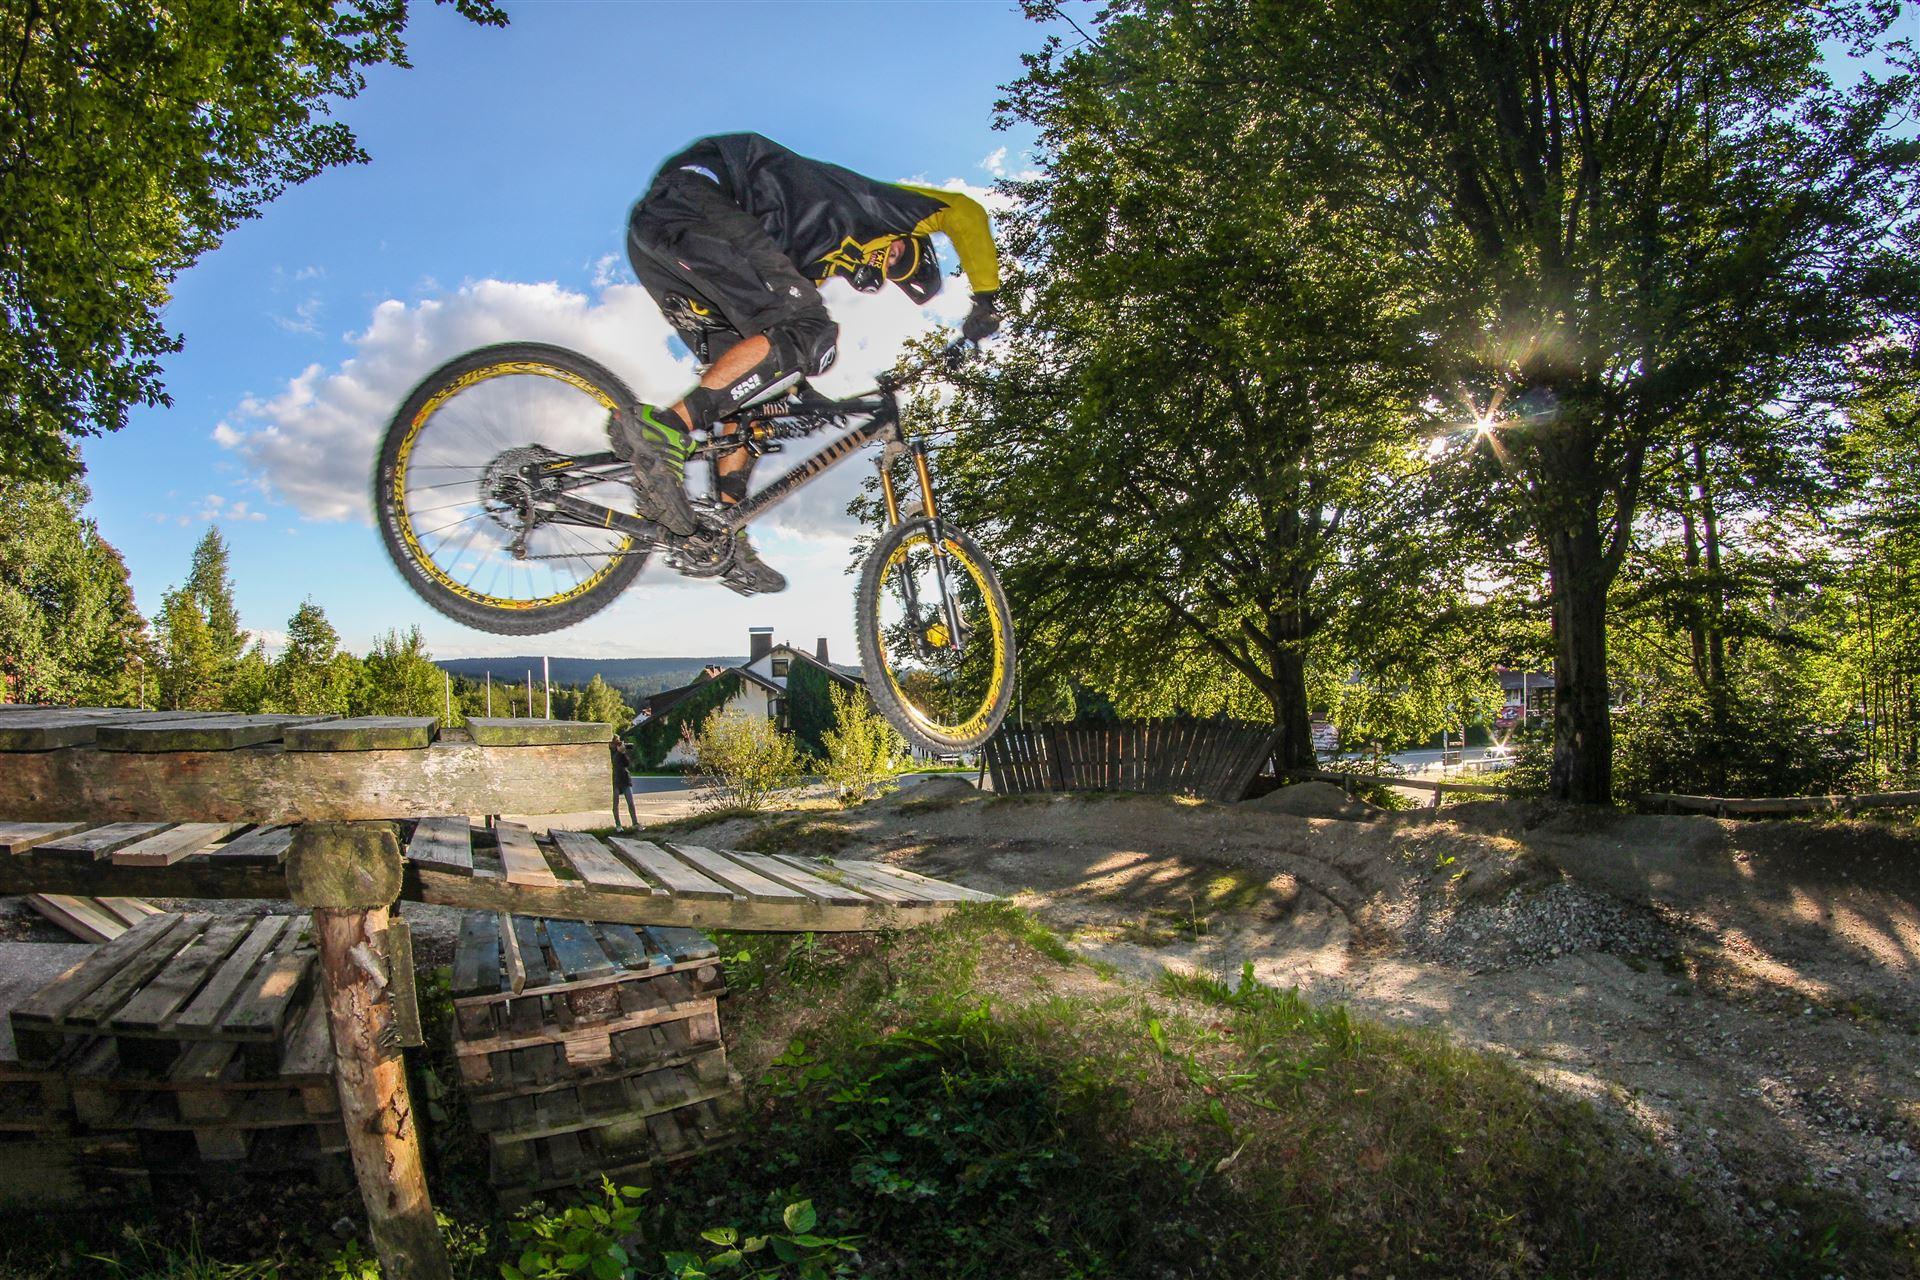 Bikepark Ochsenkopf - Biking is awesome der Film